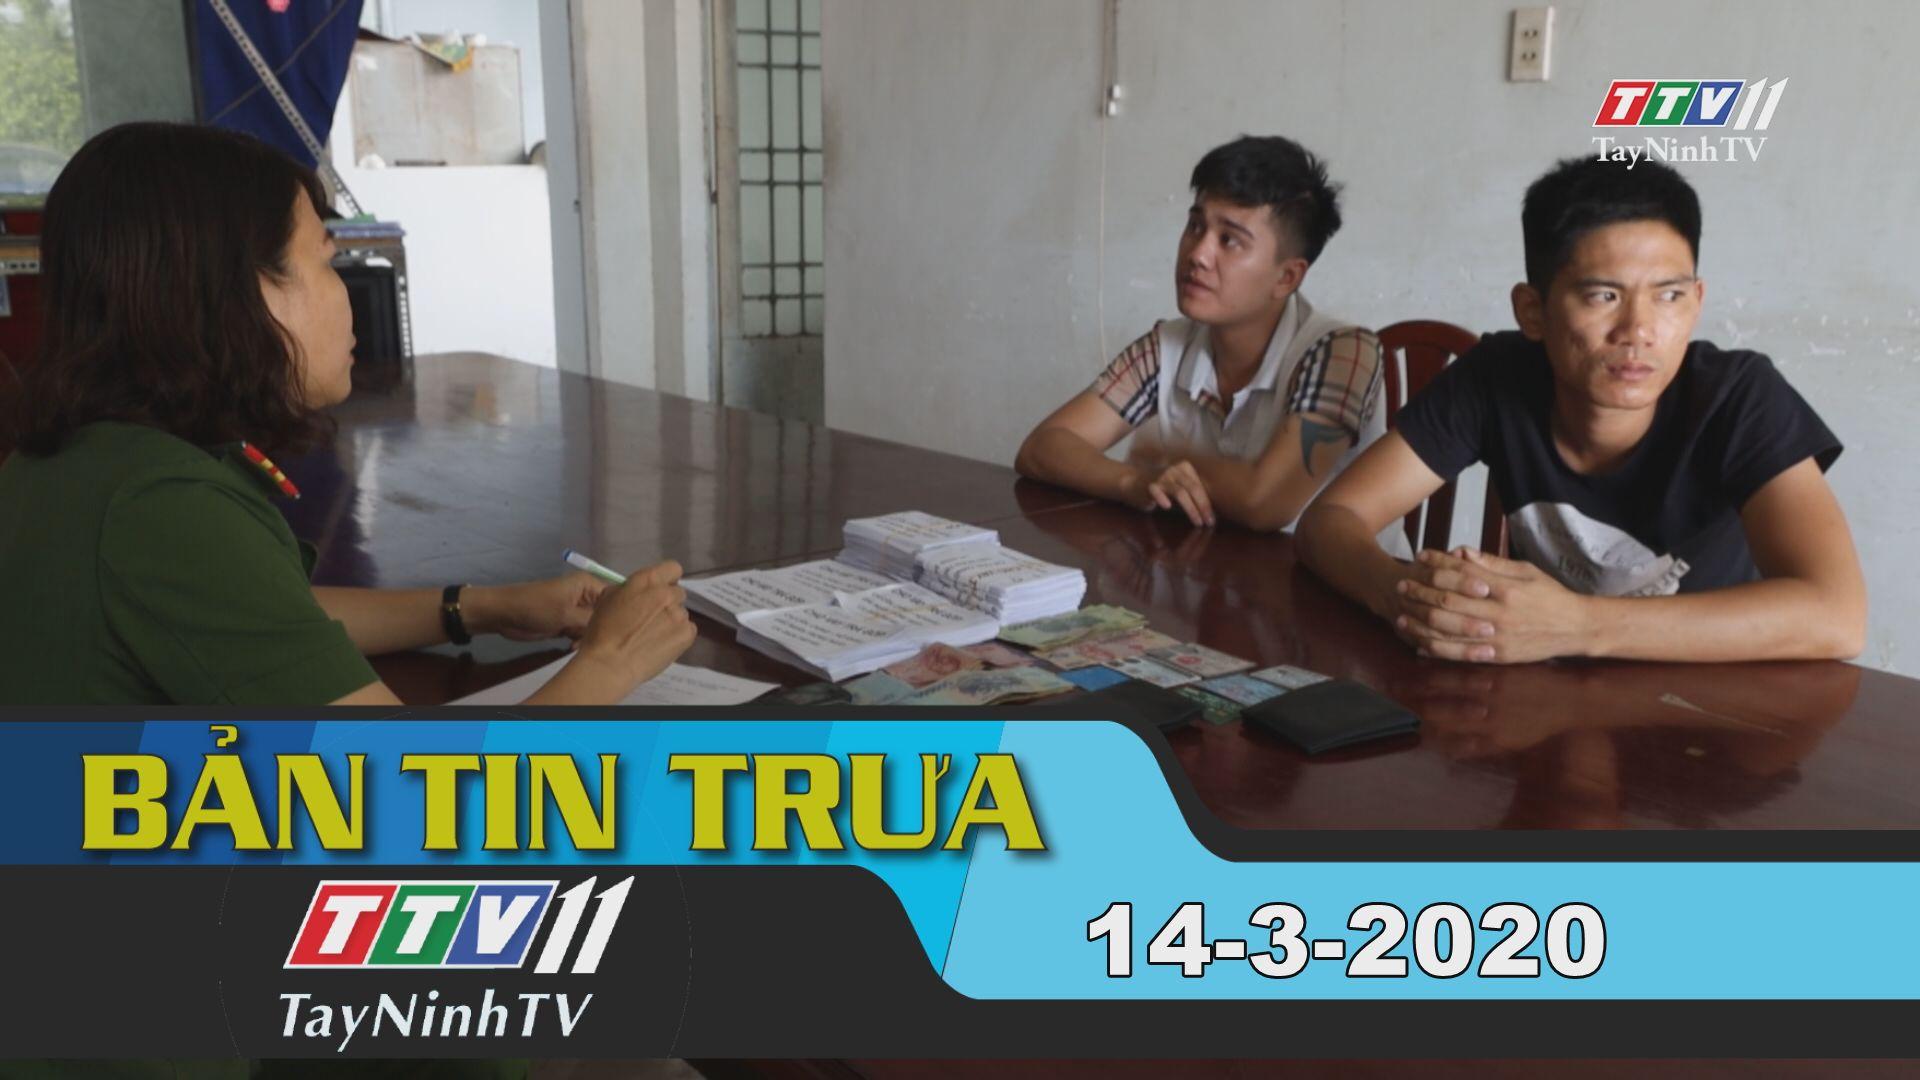 Bản tin trưa 14-3-2020 | Tin tức hôm nay | TayNinhTV